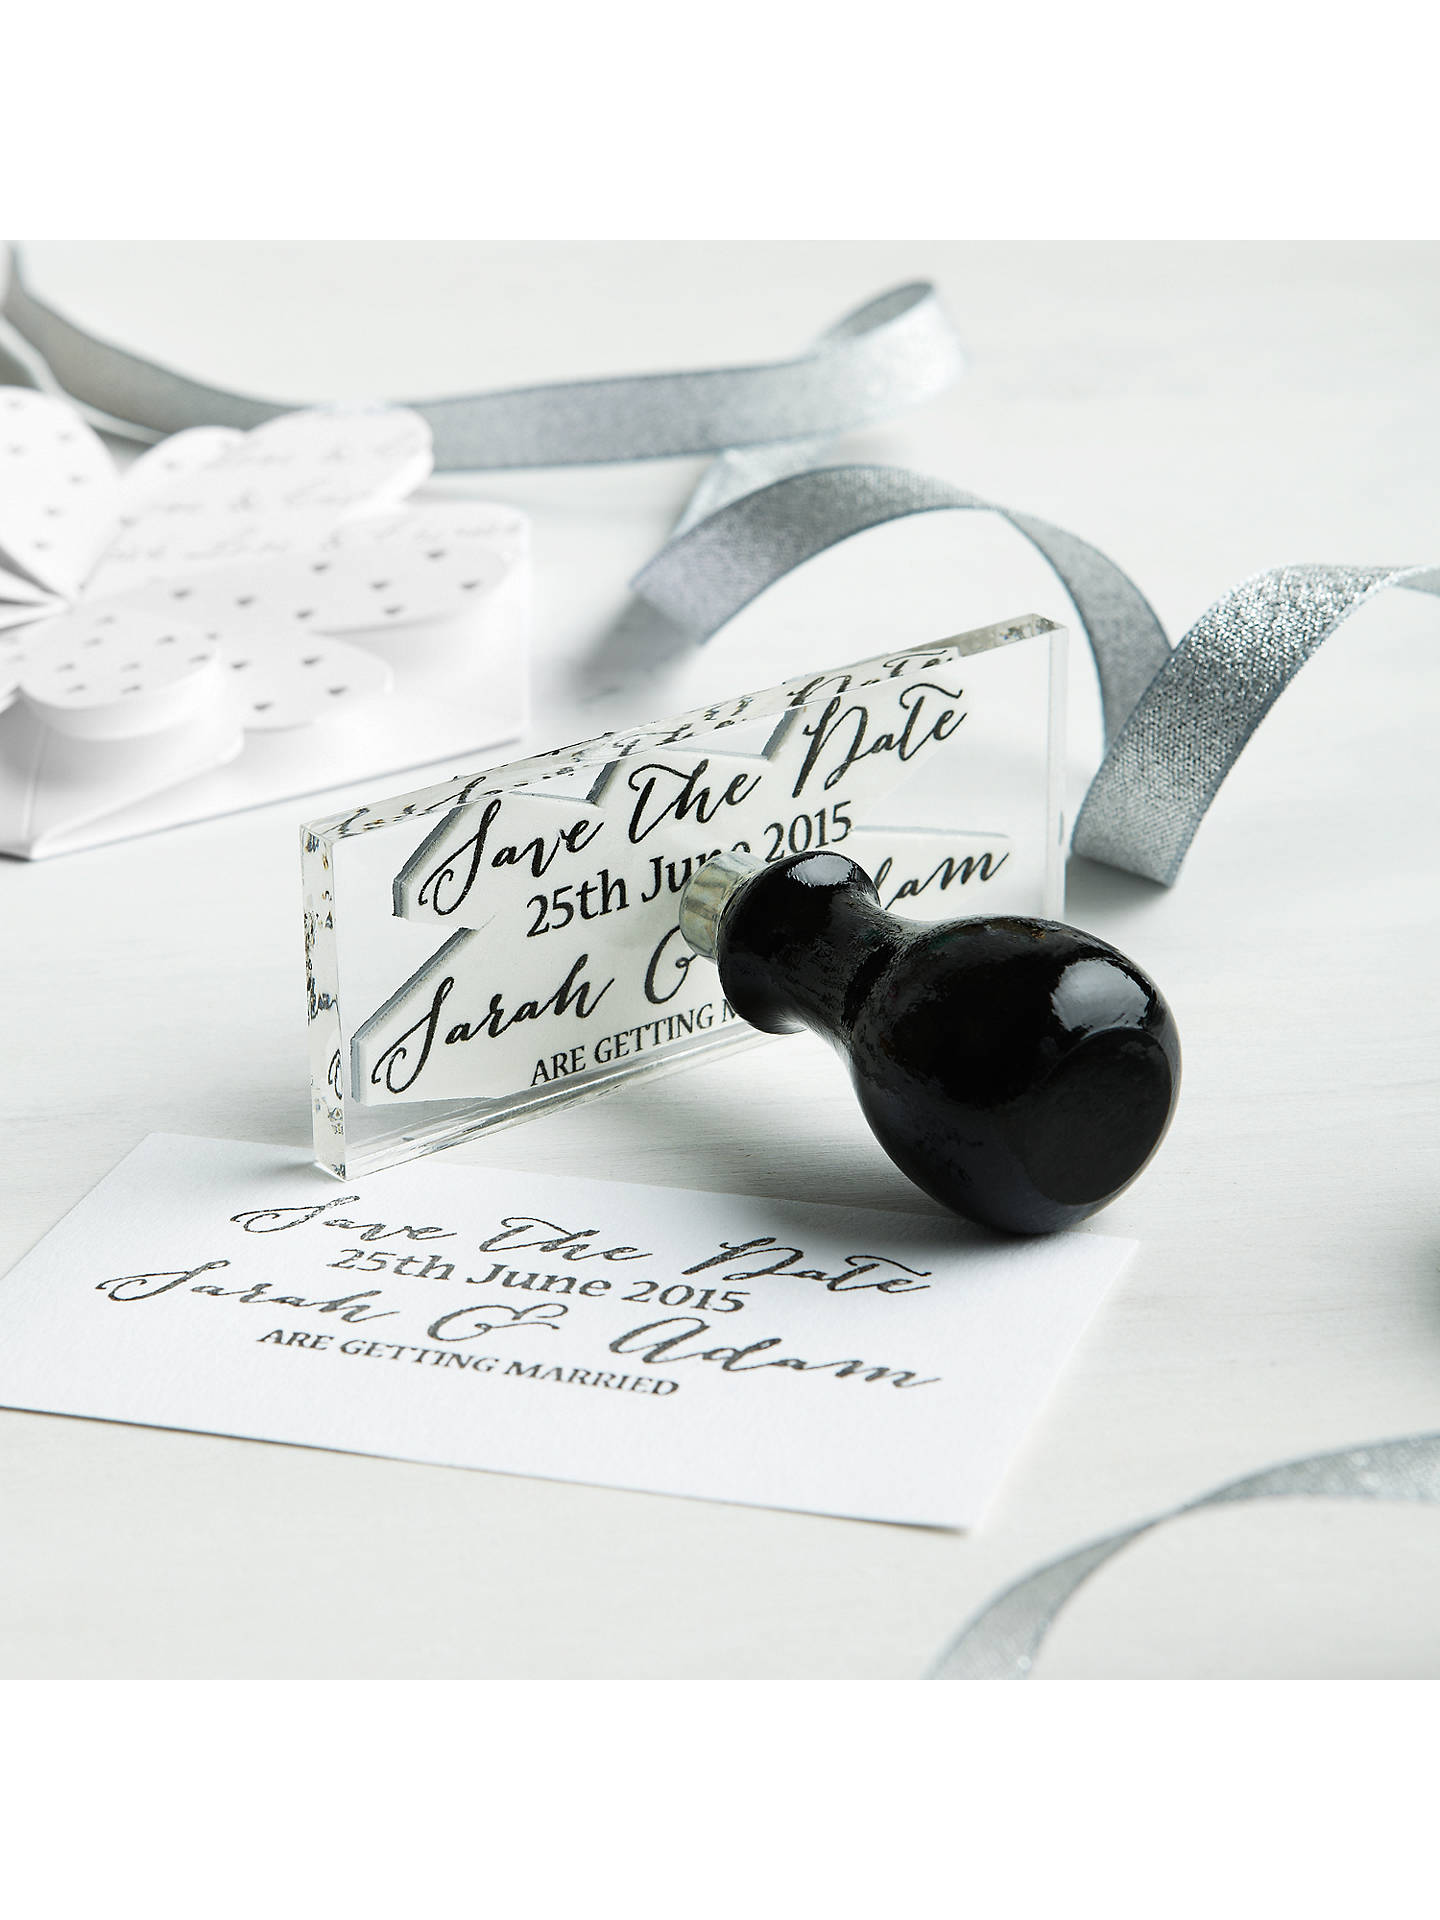 CCA Lotus Flower Personalised Wedding Invitations, Pack of 60 at ...